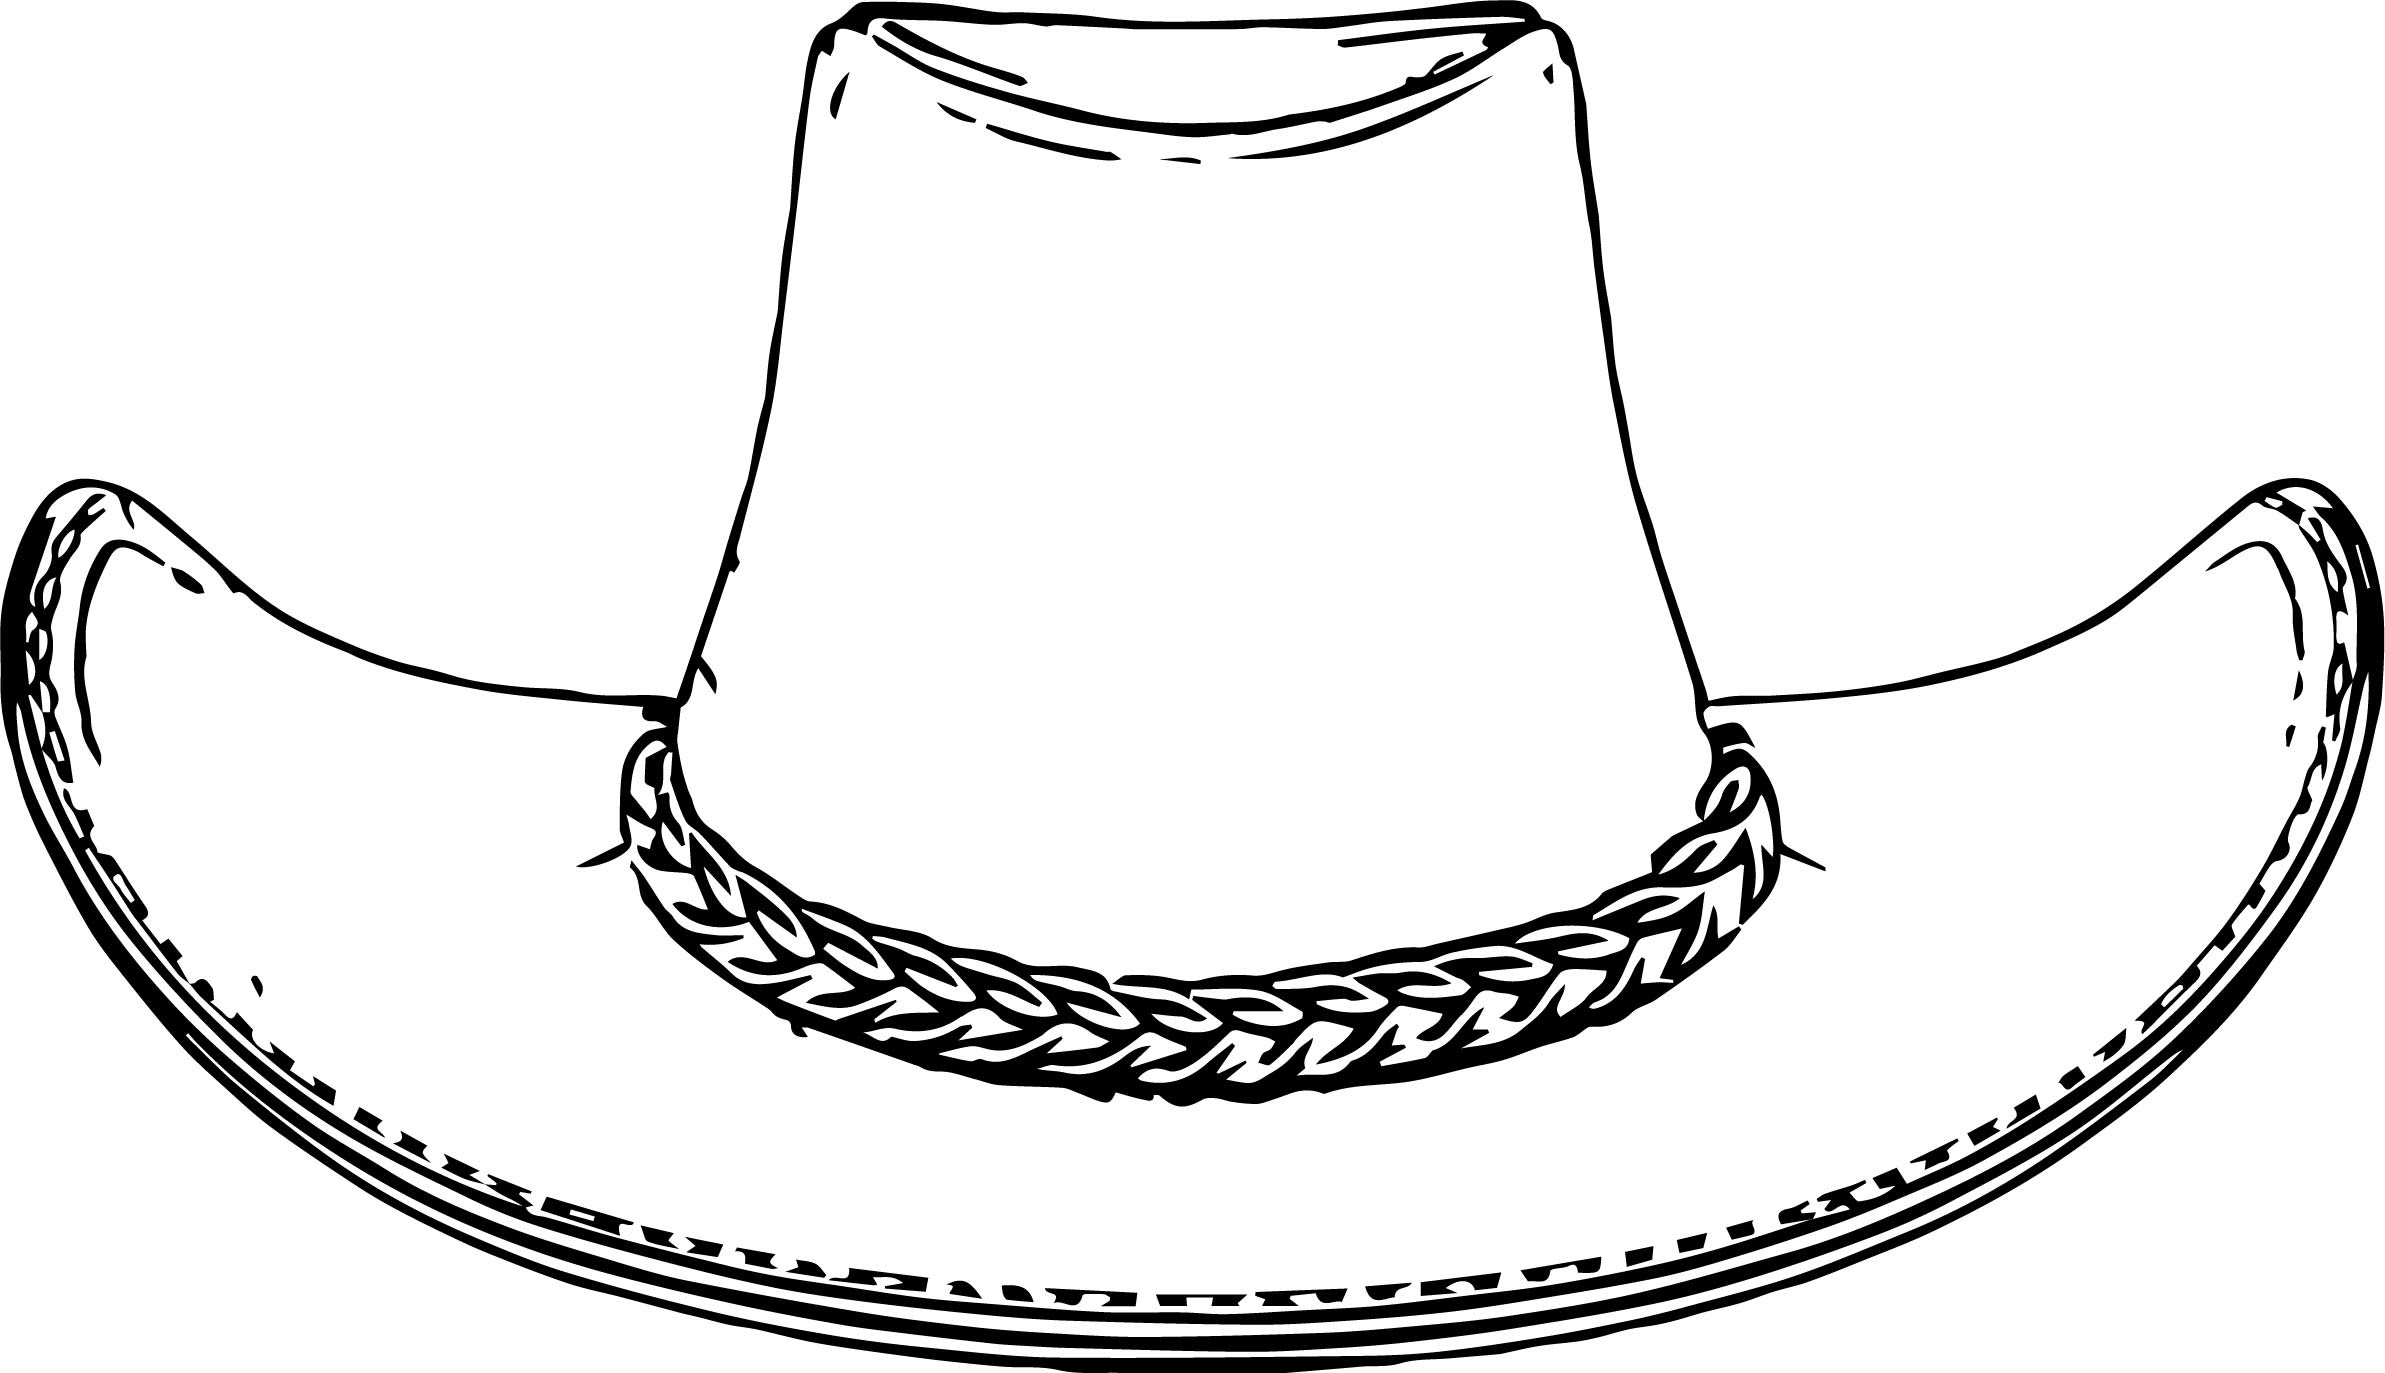 Cowboy Hat Coloring Pages Wecoloringpage.com - Coloring Pages